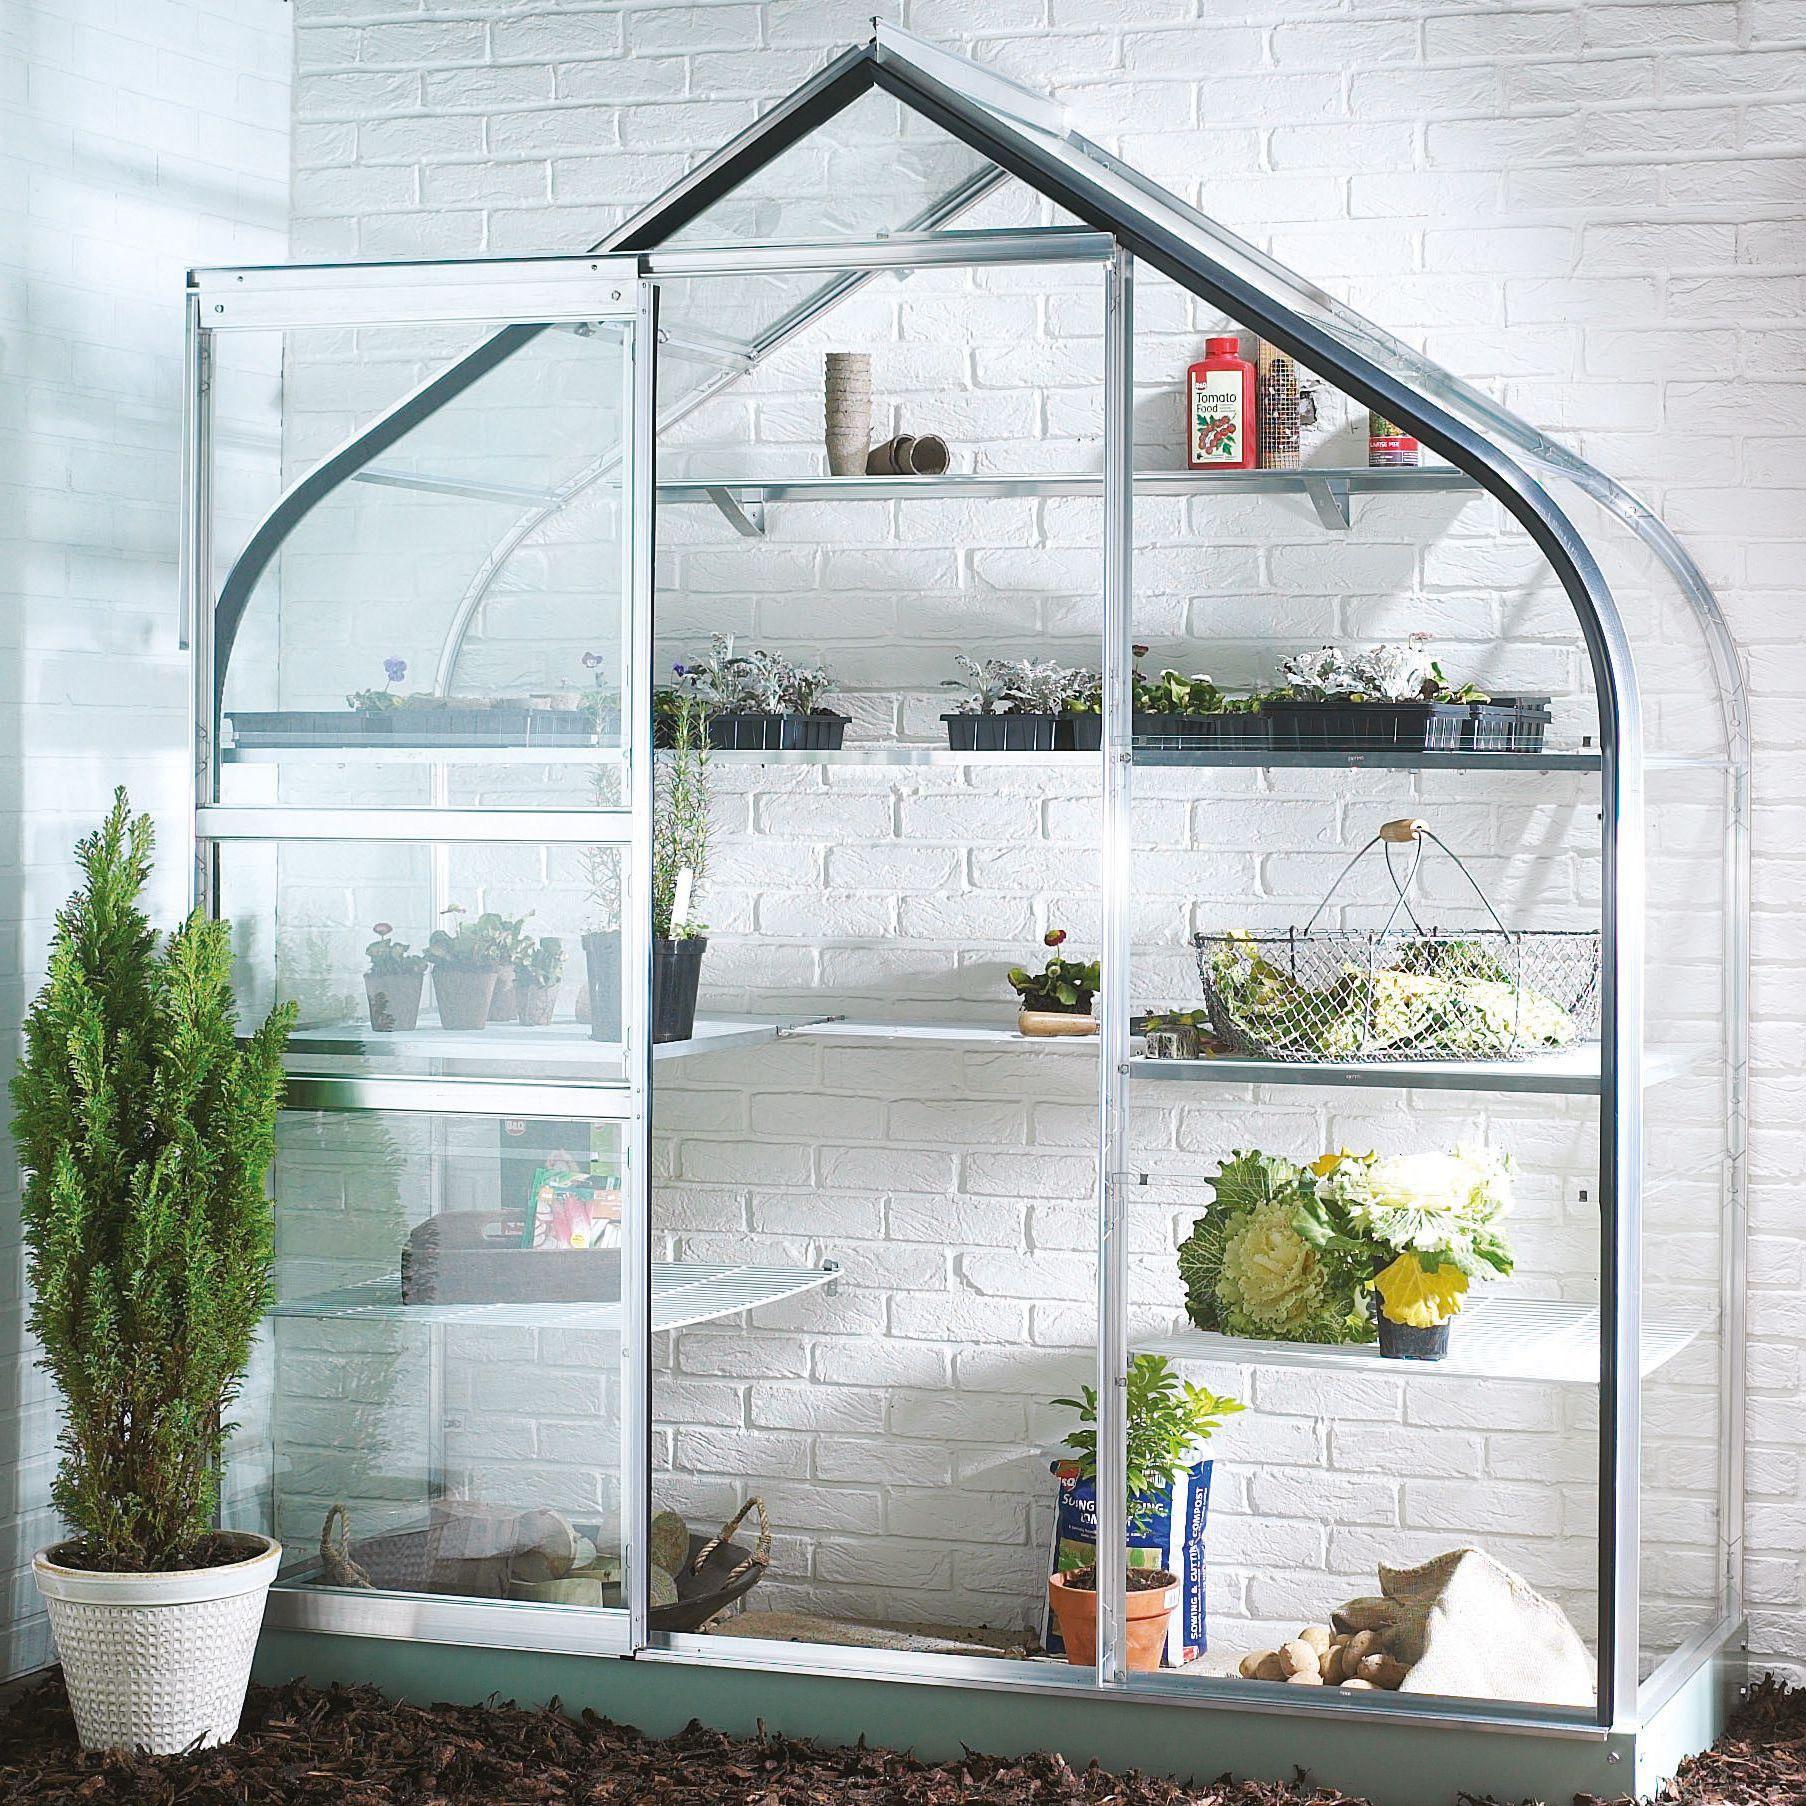 B&Q Metal 6x2 Toughened safety glass wall garden